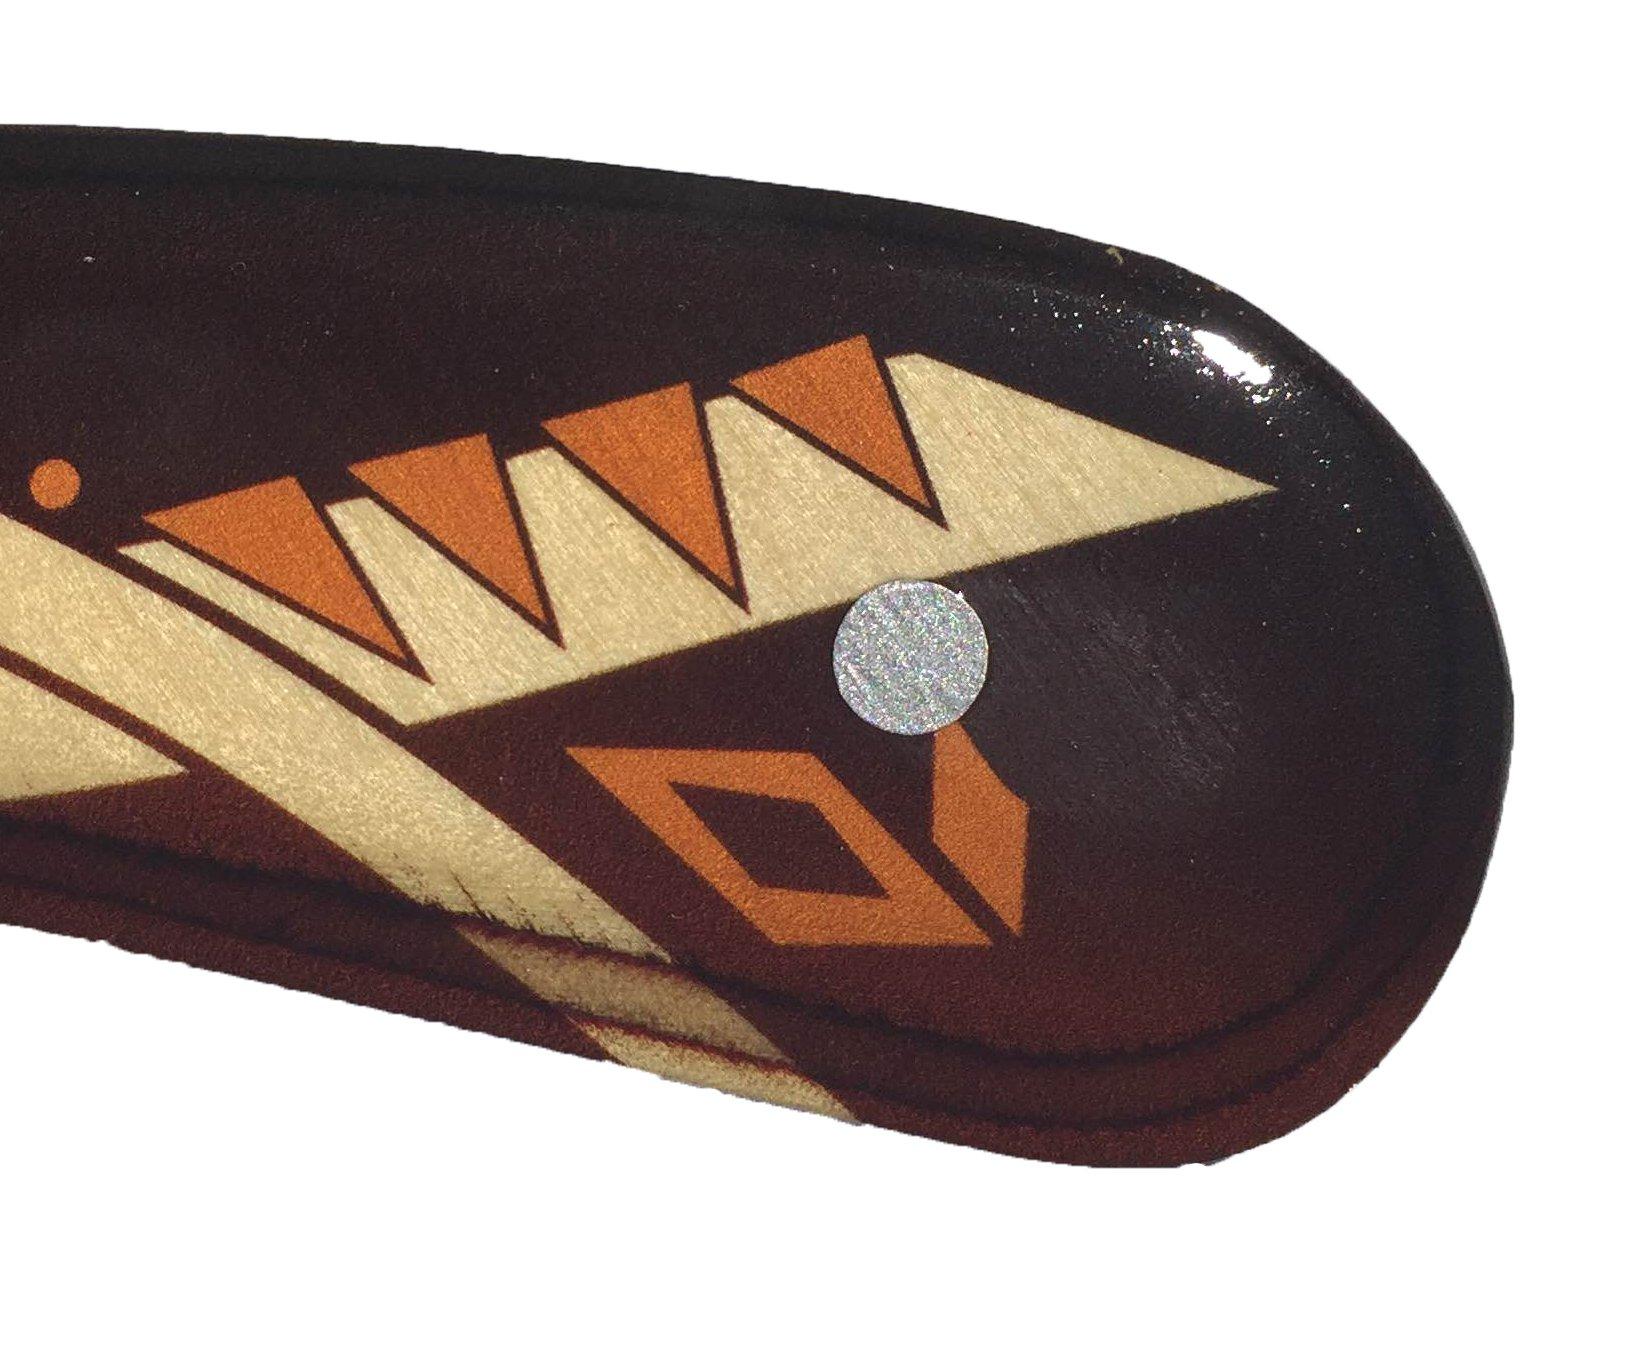 RangeMaster Decorated Australian Wooden Boomerang - Aboriginal Art Style by Colorado Boomerangs (Image #5)